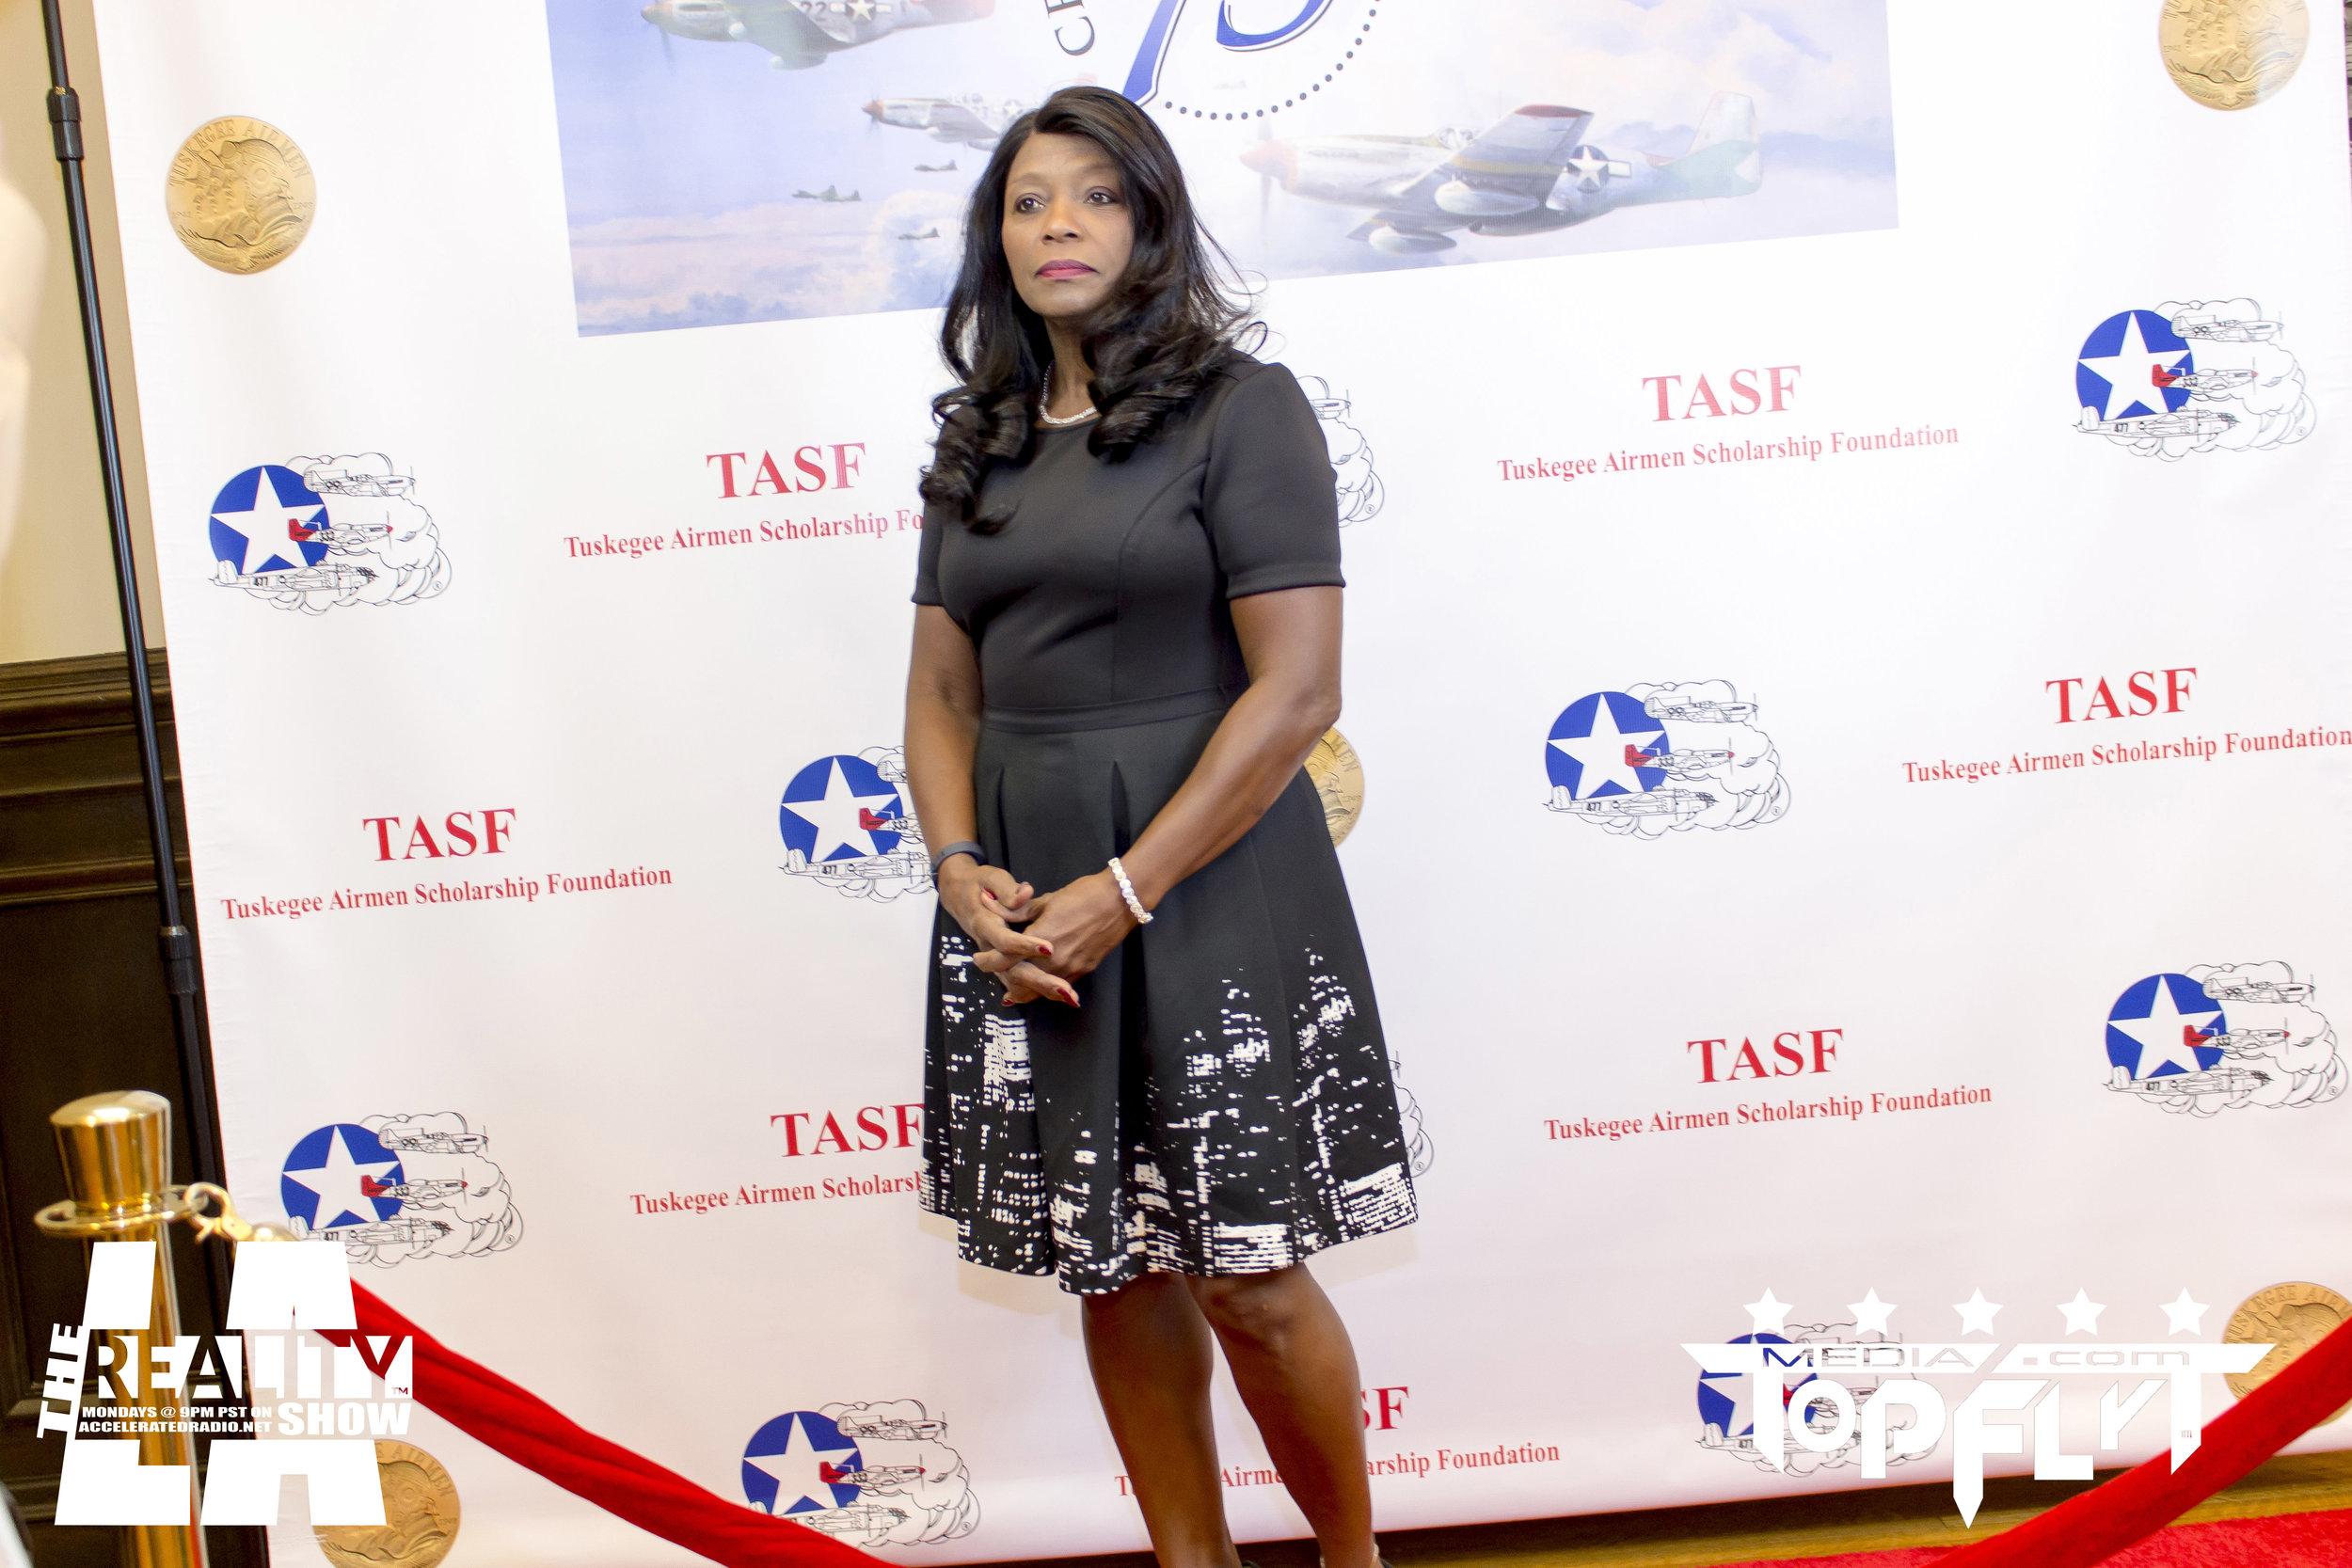 The Reality Show LA - Tuskegee Airmen 75th Anniversary VIP Reception_5.jpg